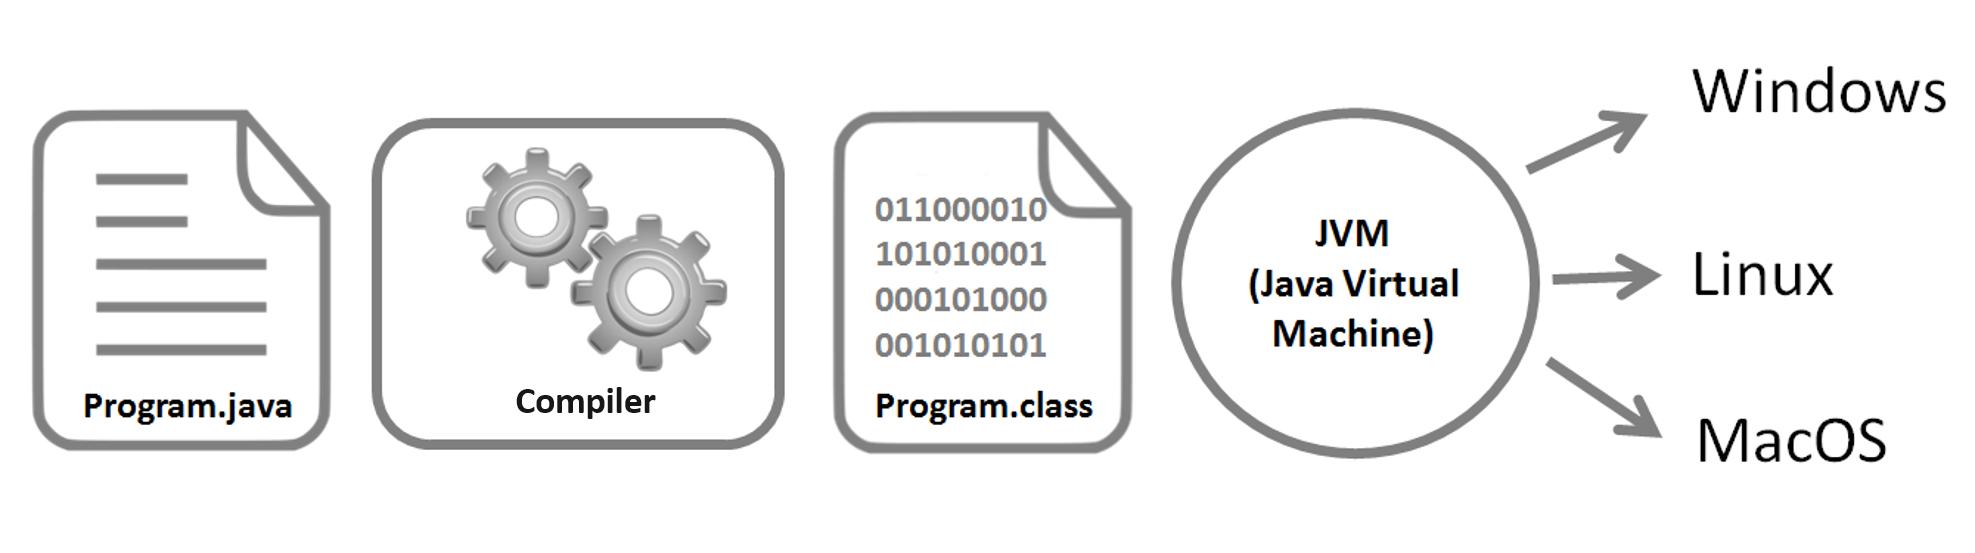 JVM-Vertex-Academy. Java popularity